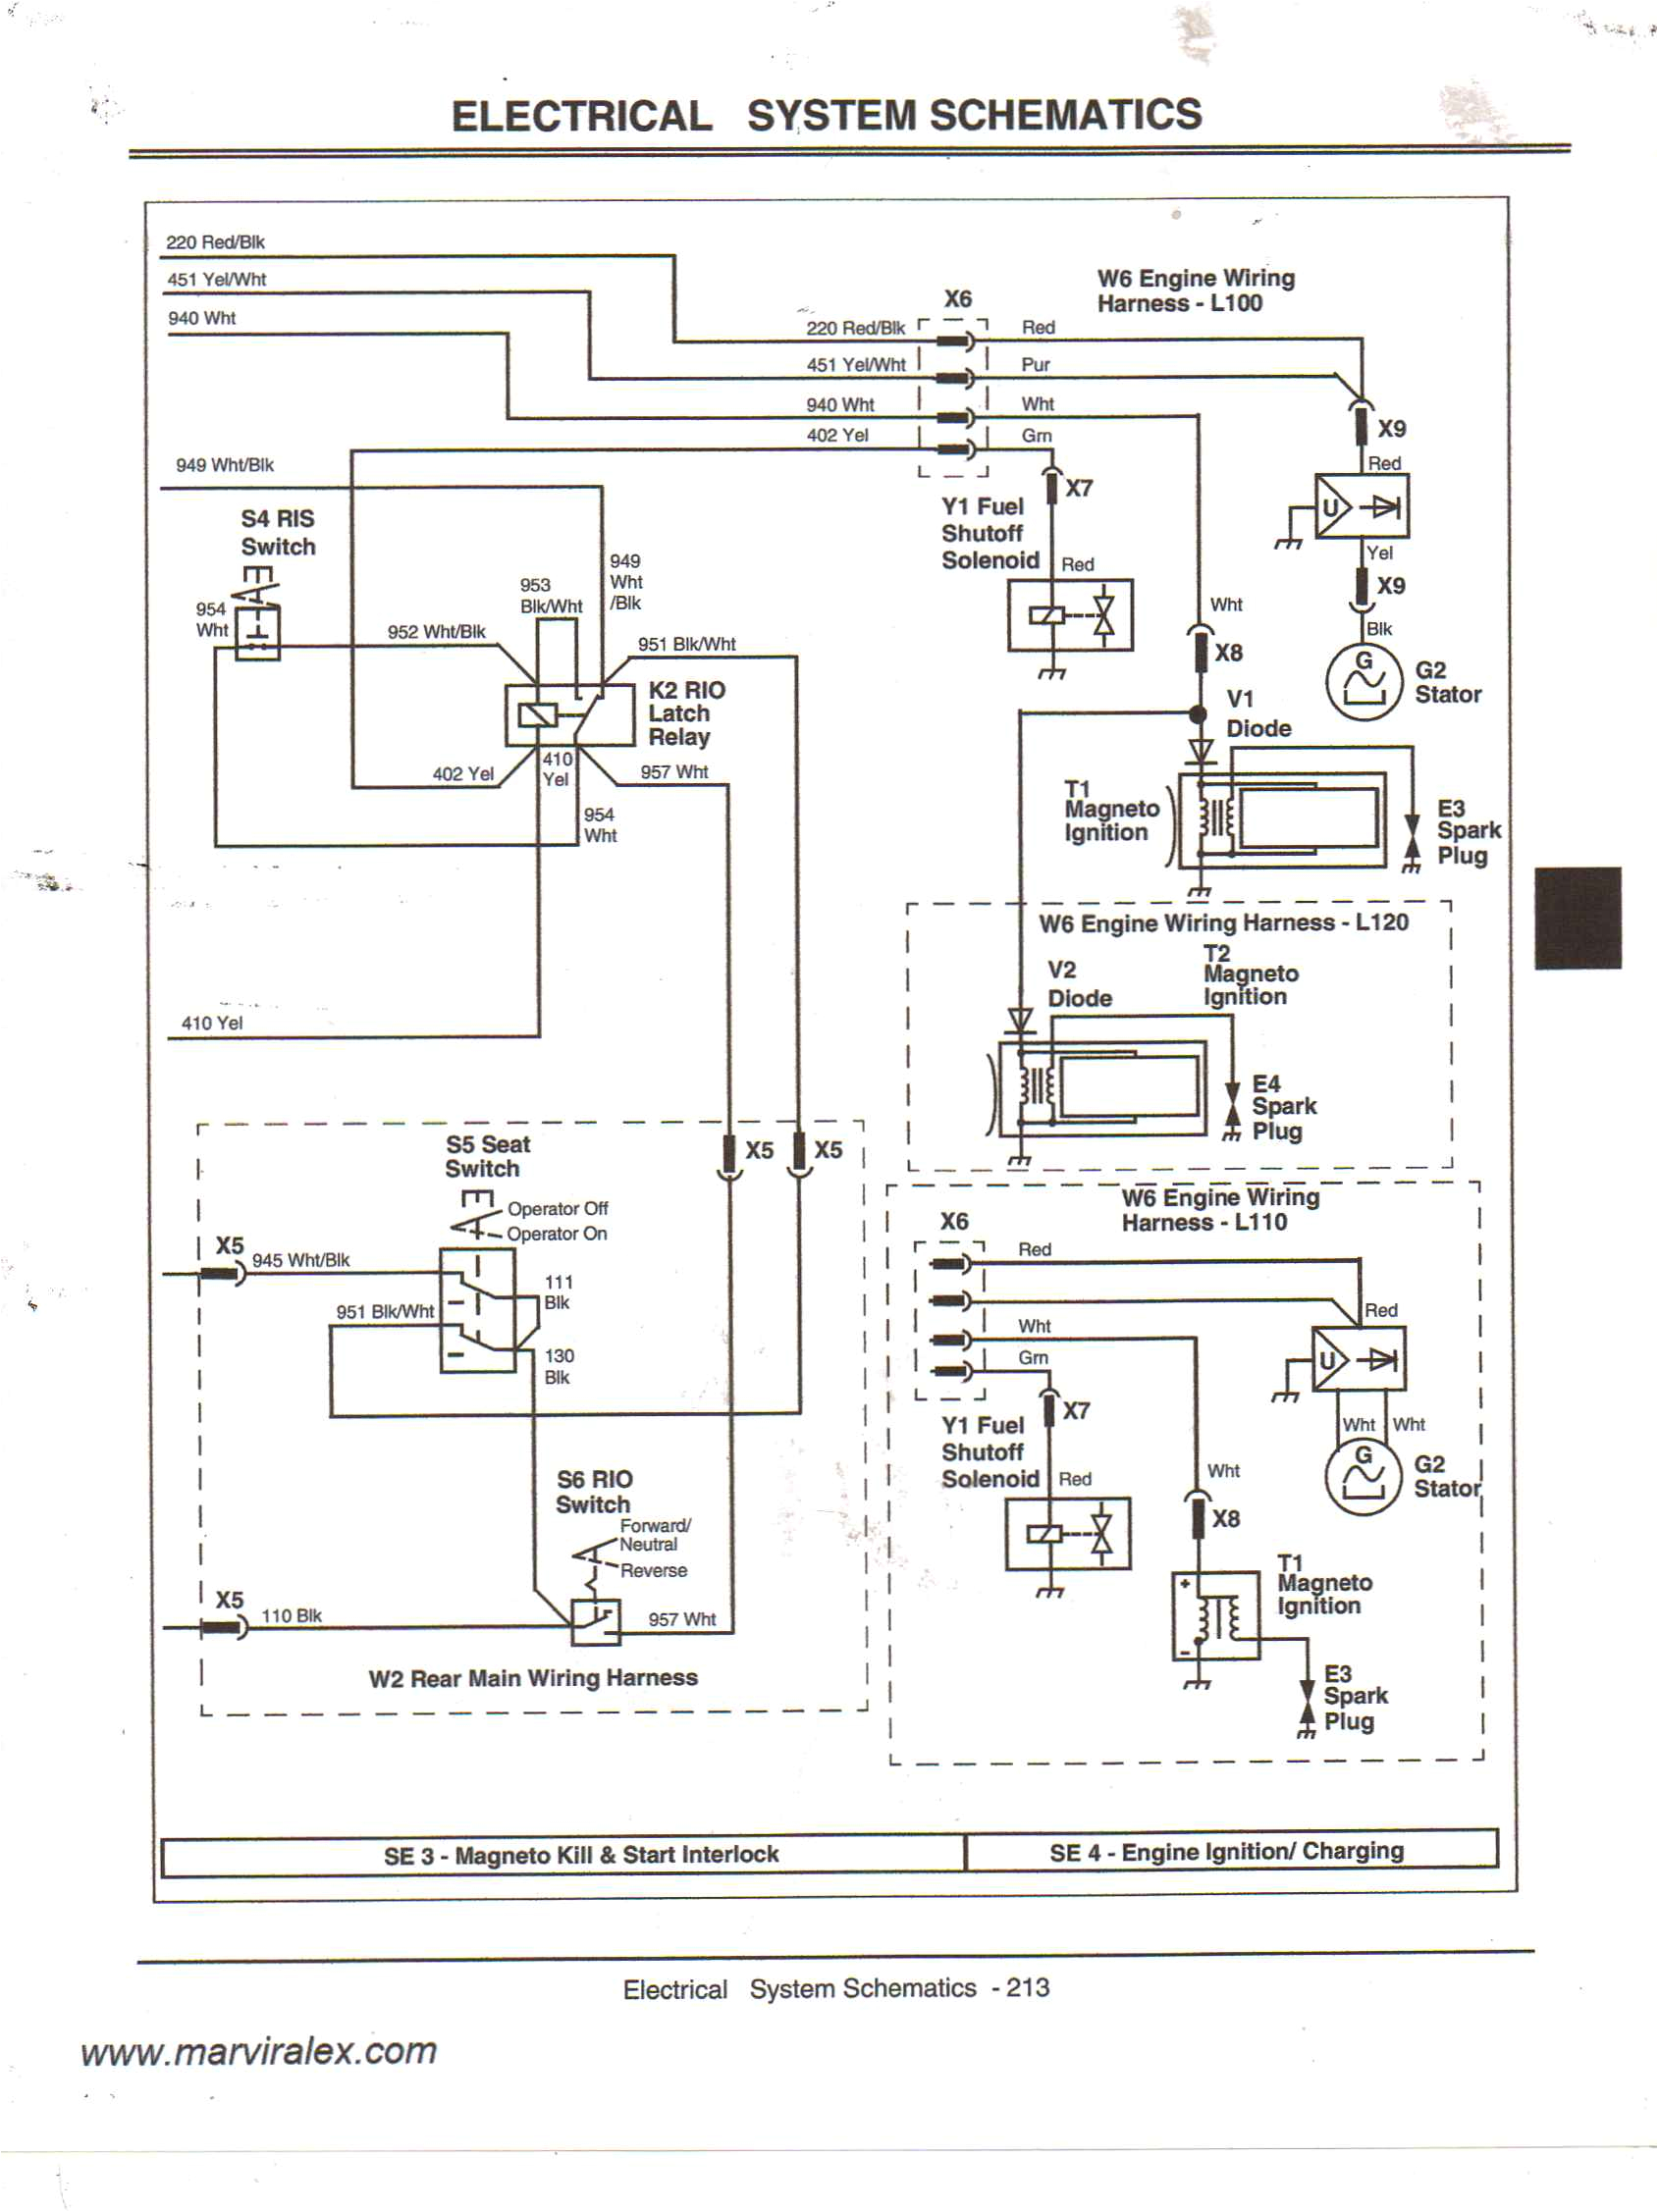 John Deere Lt160 Wiring Diagram John Deere Lt180 Wiring Diagram Wiring Diagram Article Review